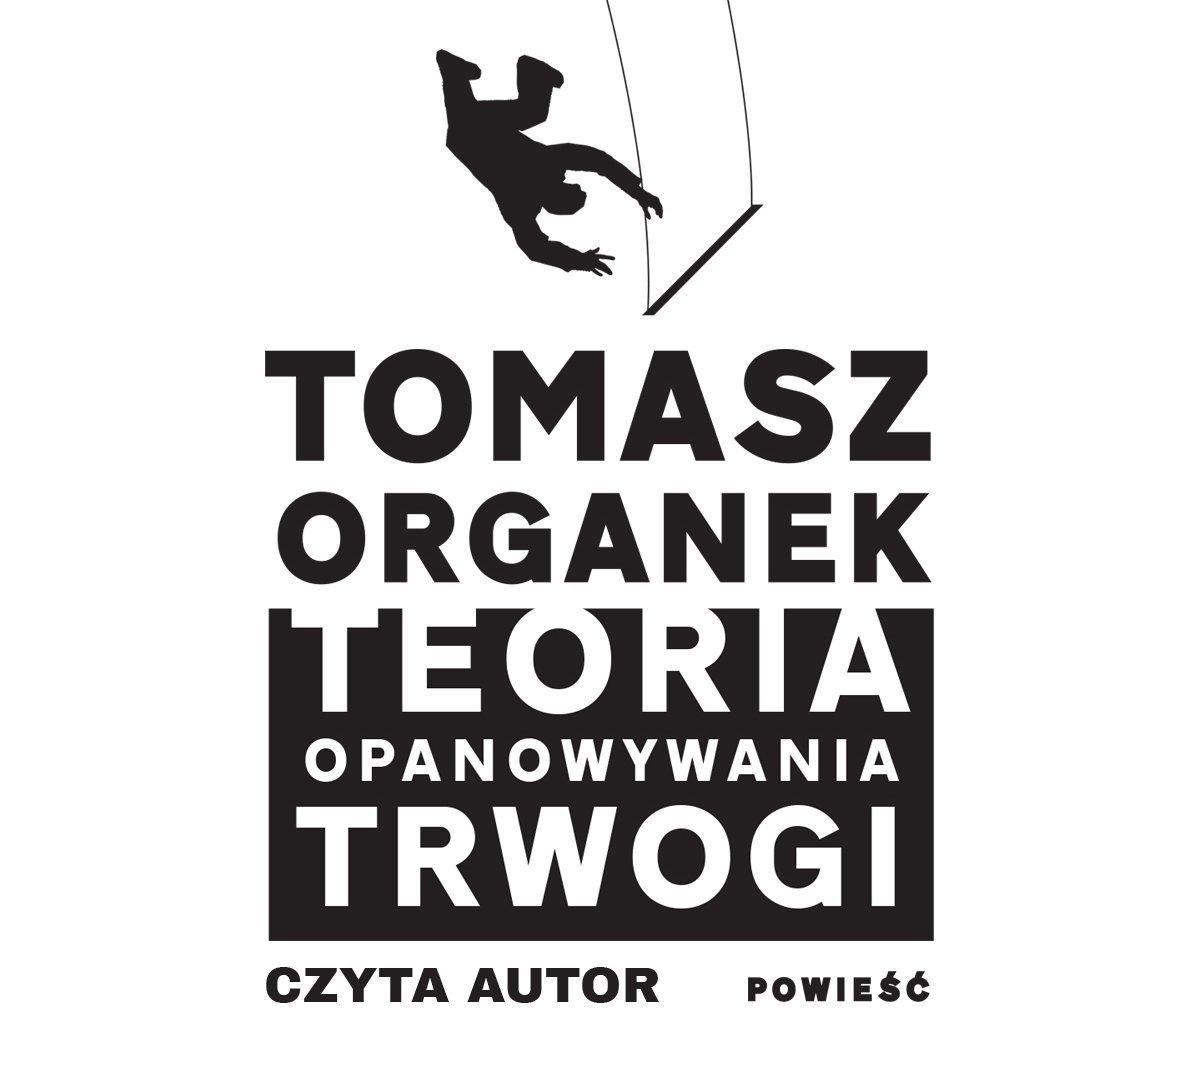 ORGANEK TOMASZ – TEORIA OPANOWYWANIA TRWOGI